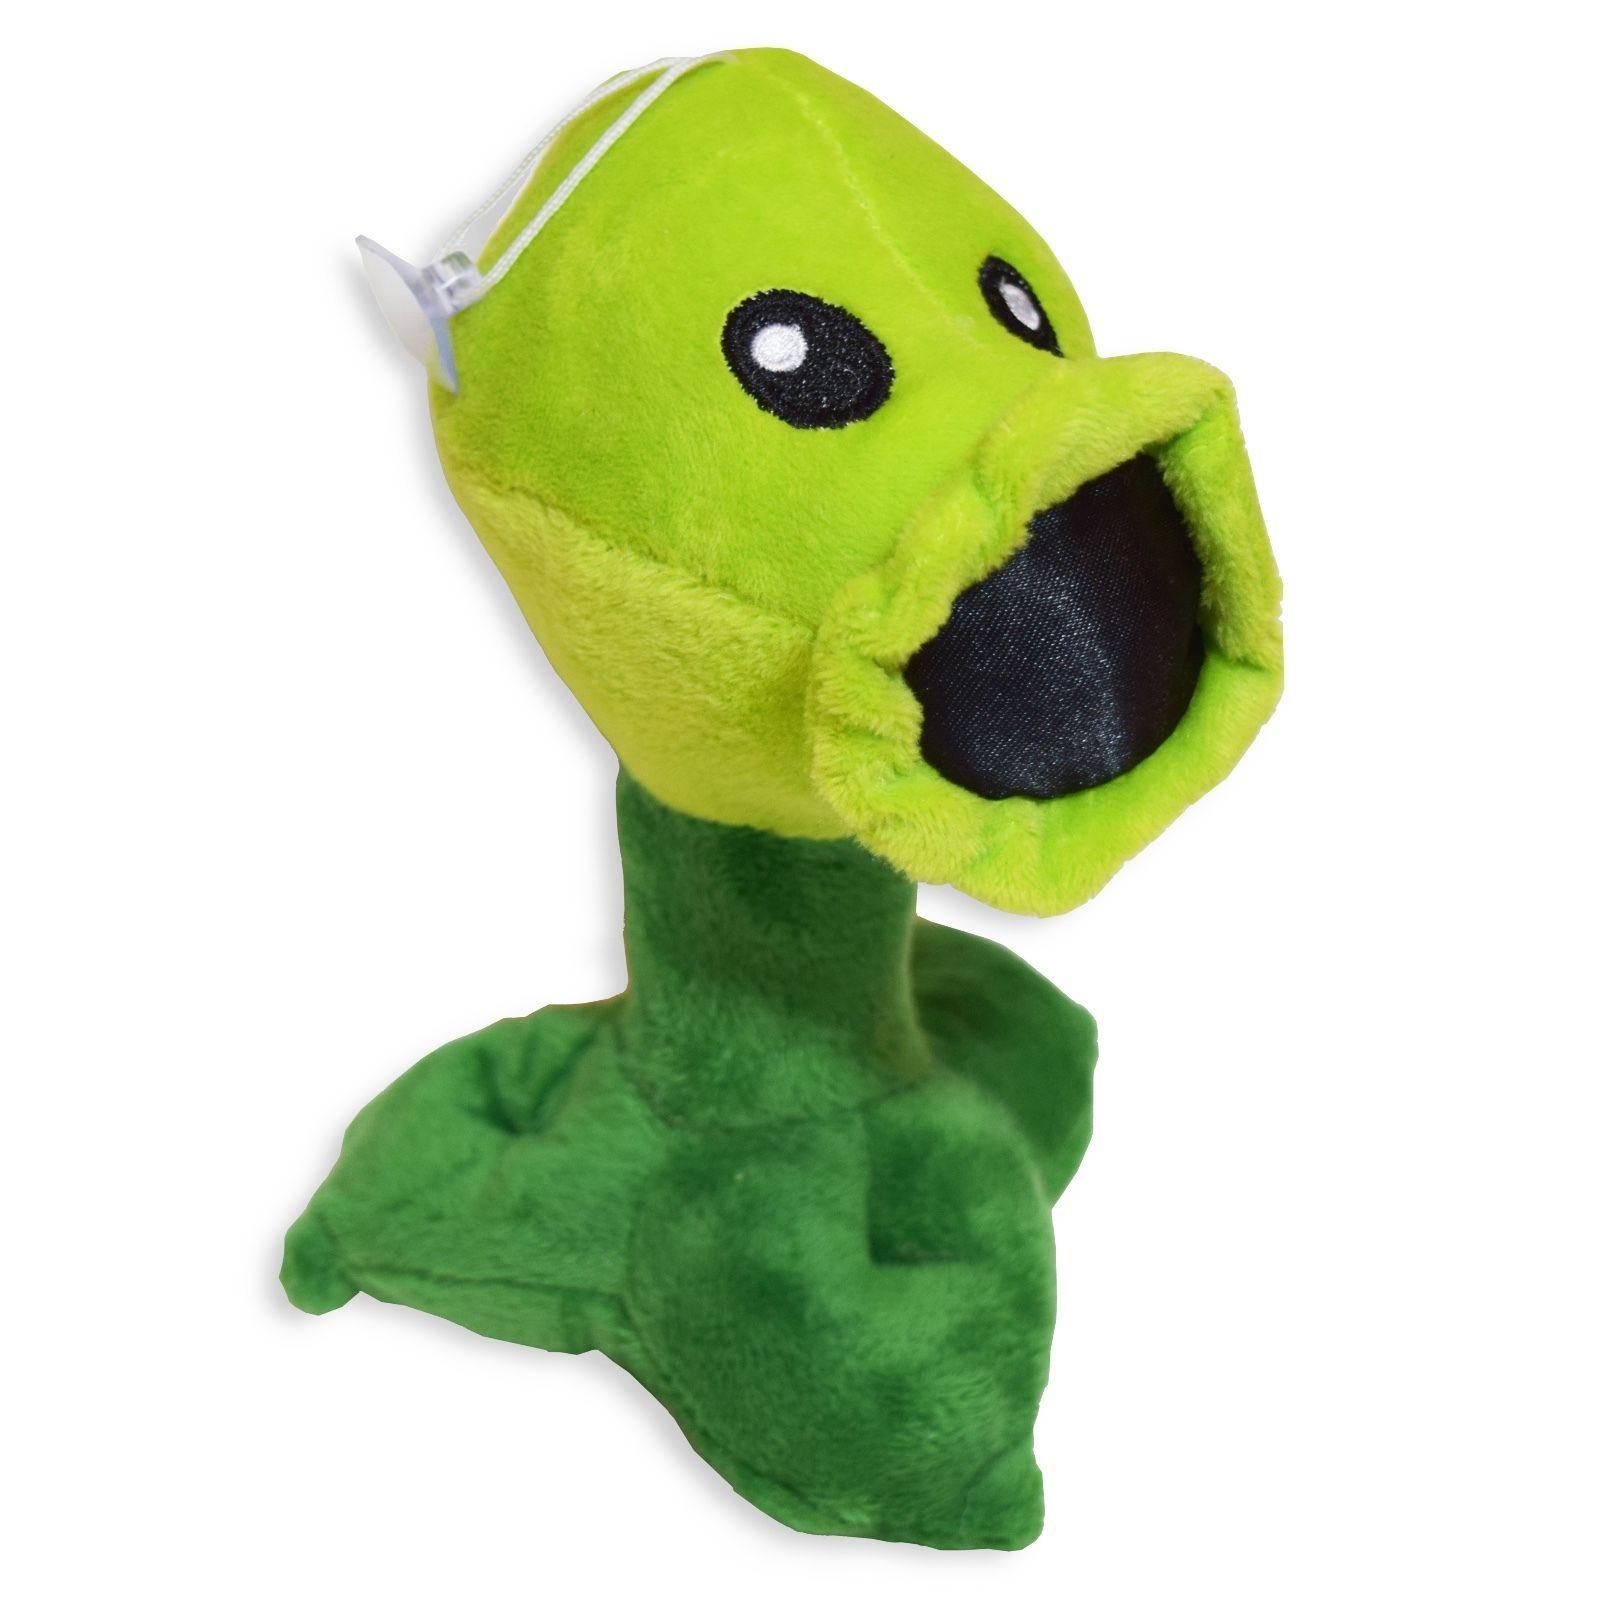 30cm Plants Vs Zombies Gatling Pea Peashooter Soft Plush Stuffed Toy New